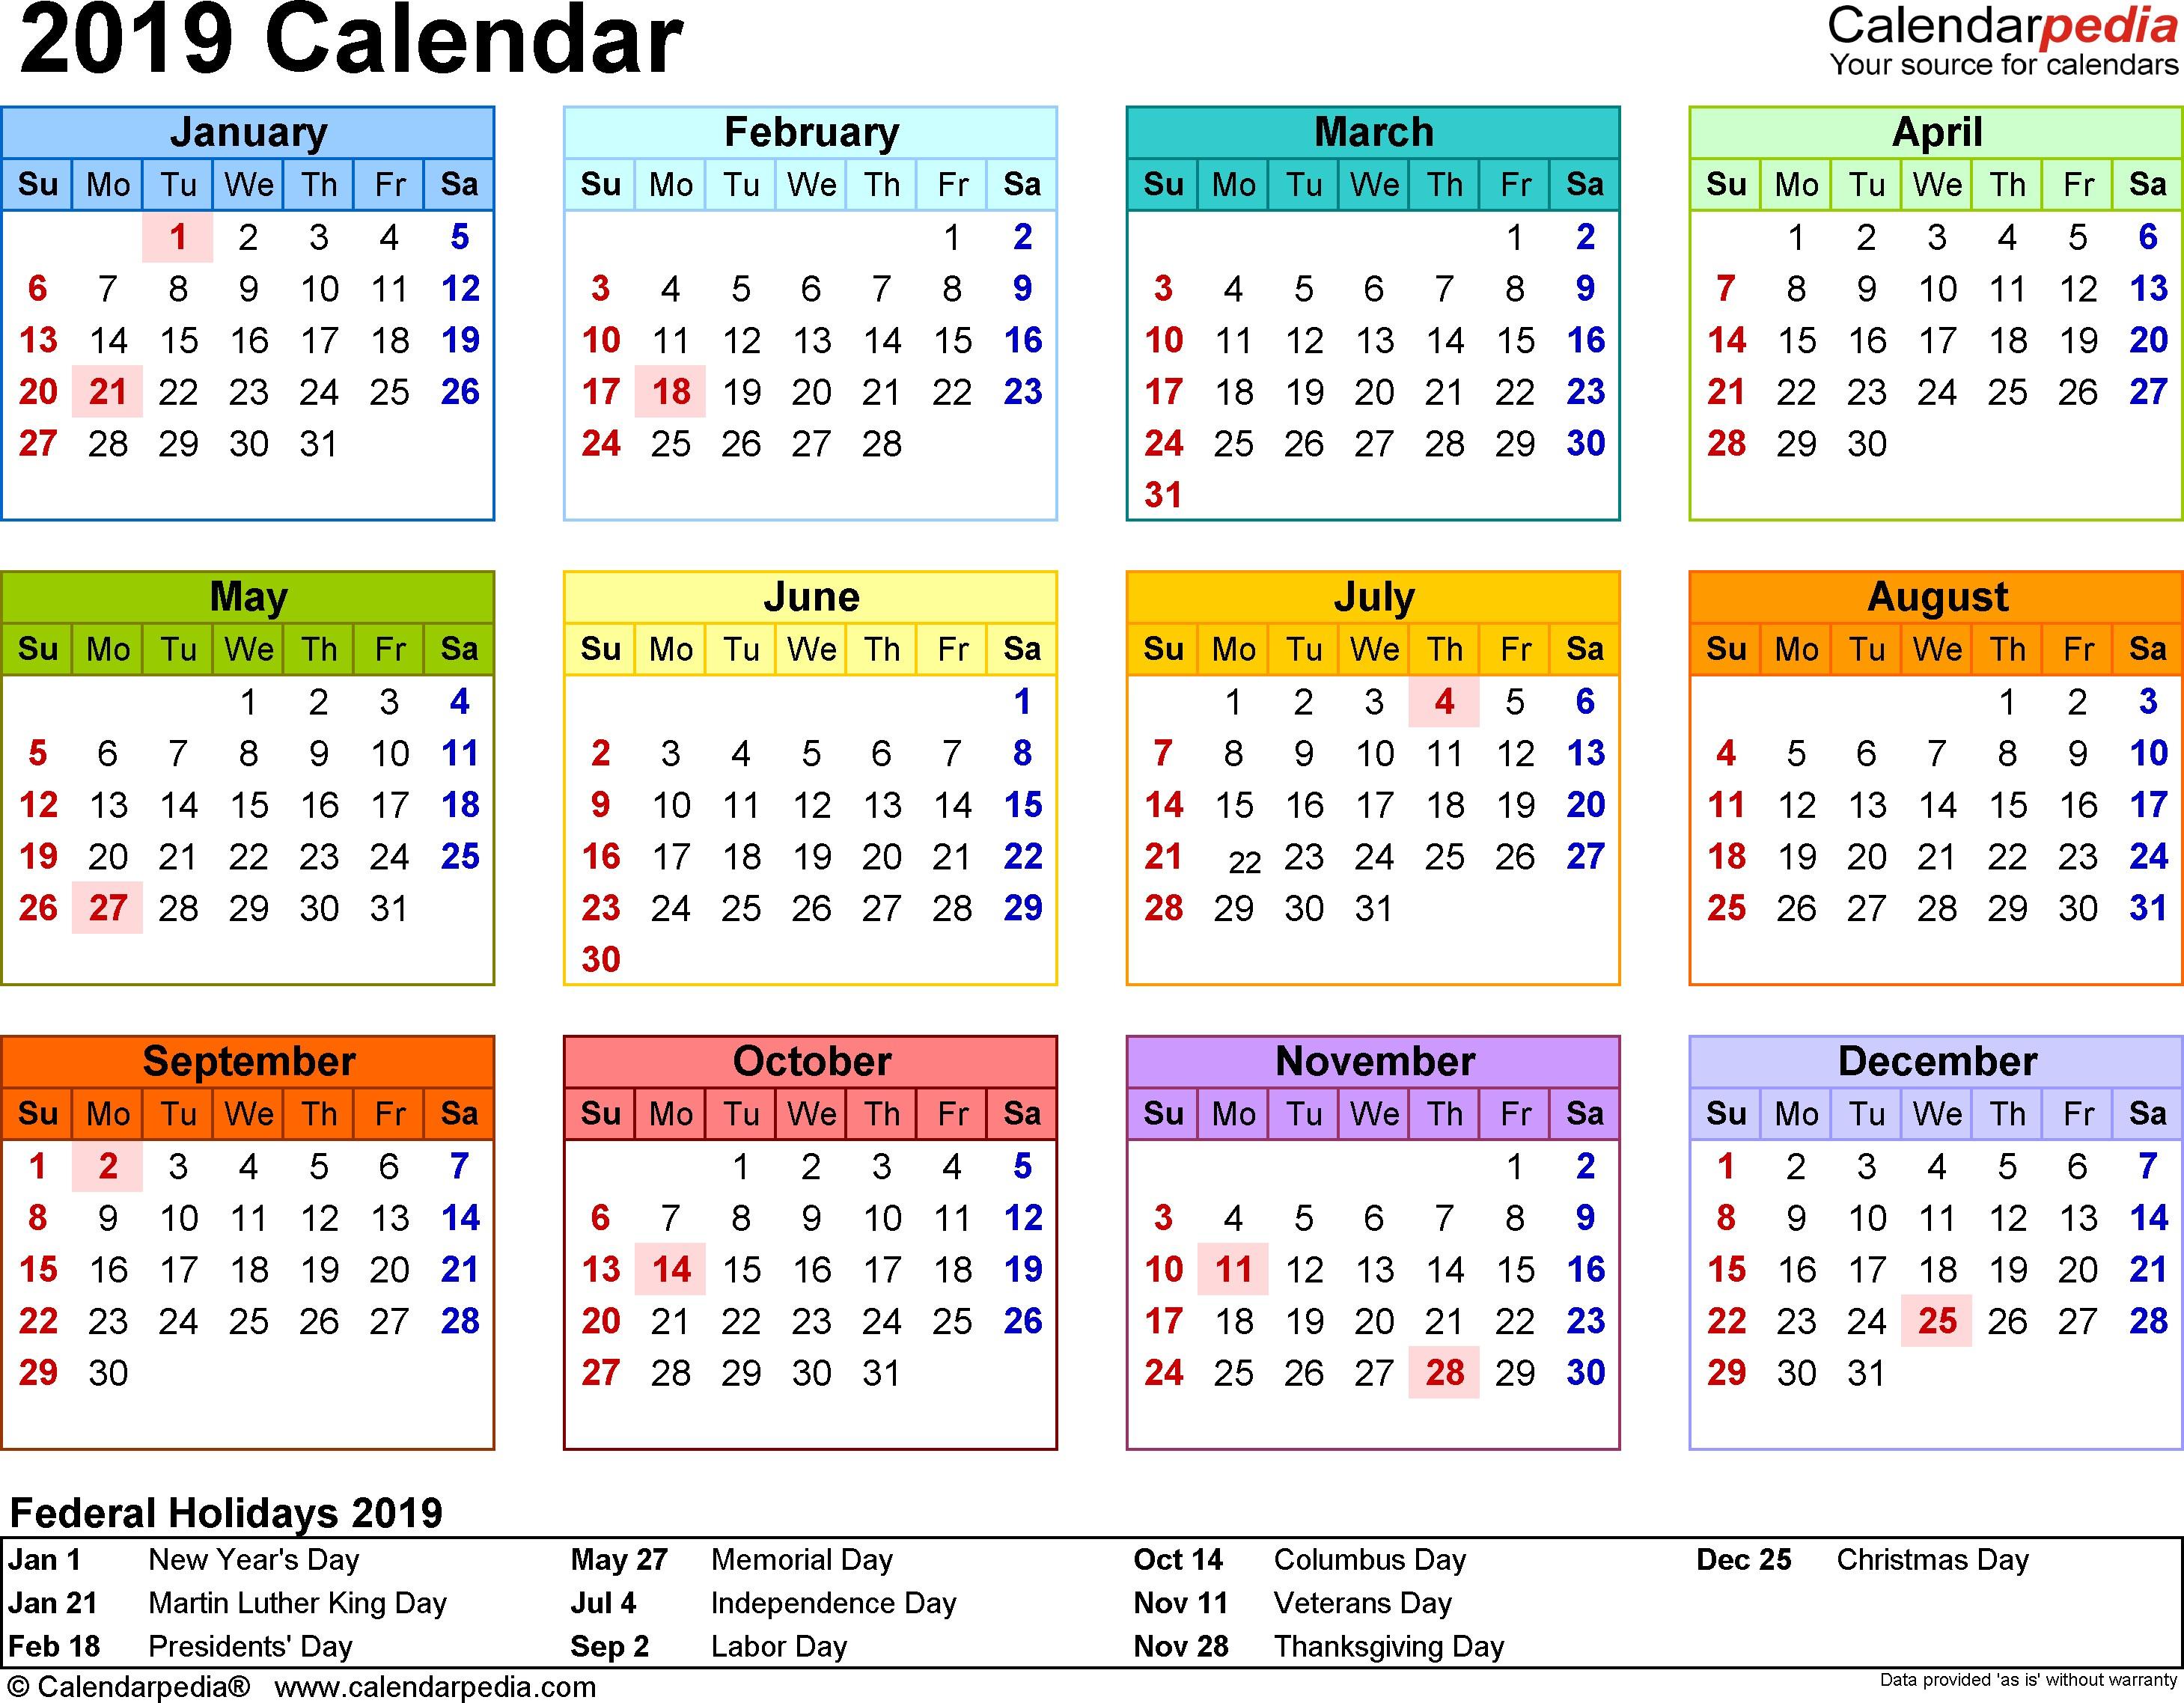 Calendar June 2019 Template Australia | Calendar Template in Calendar June Template Australia